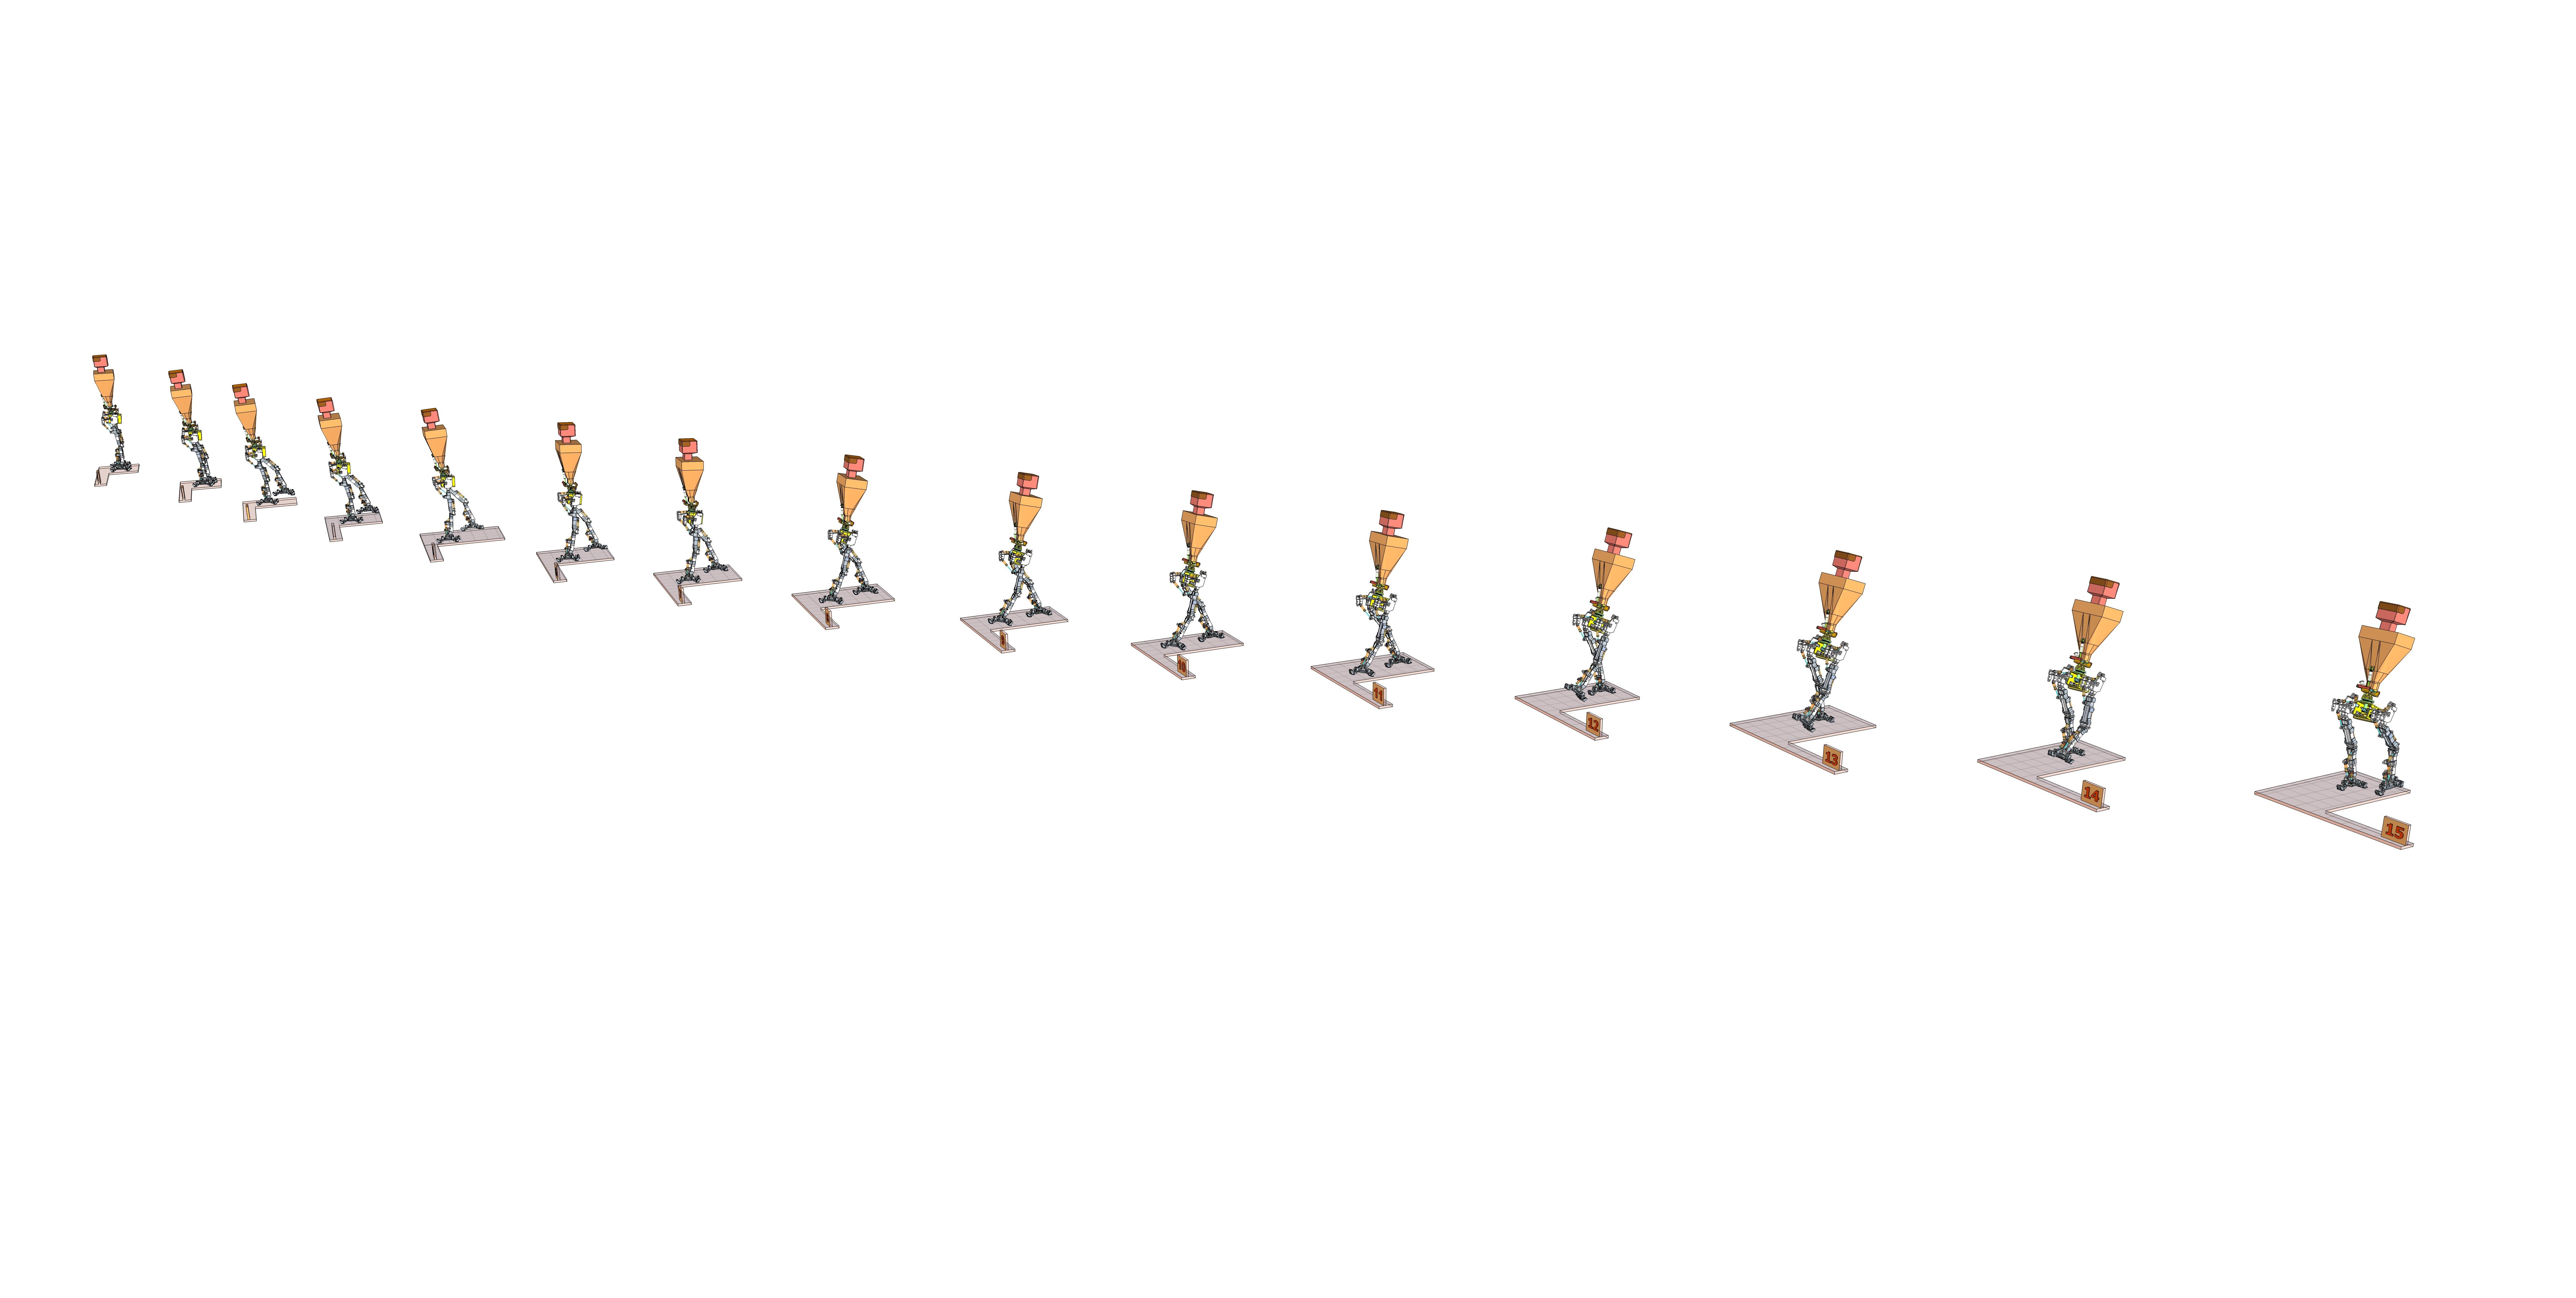 Little Robot Walking Sequence Stances 1-15